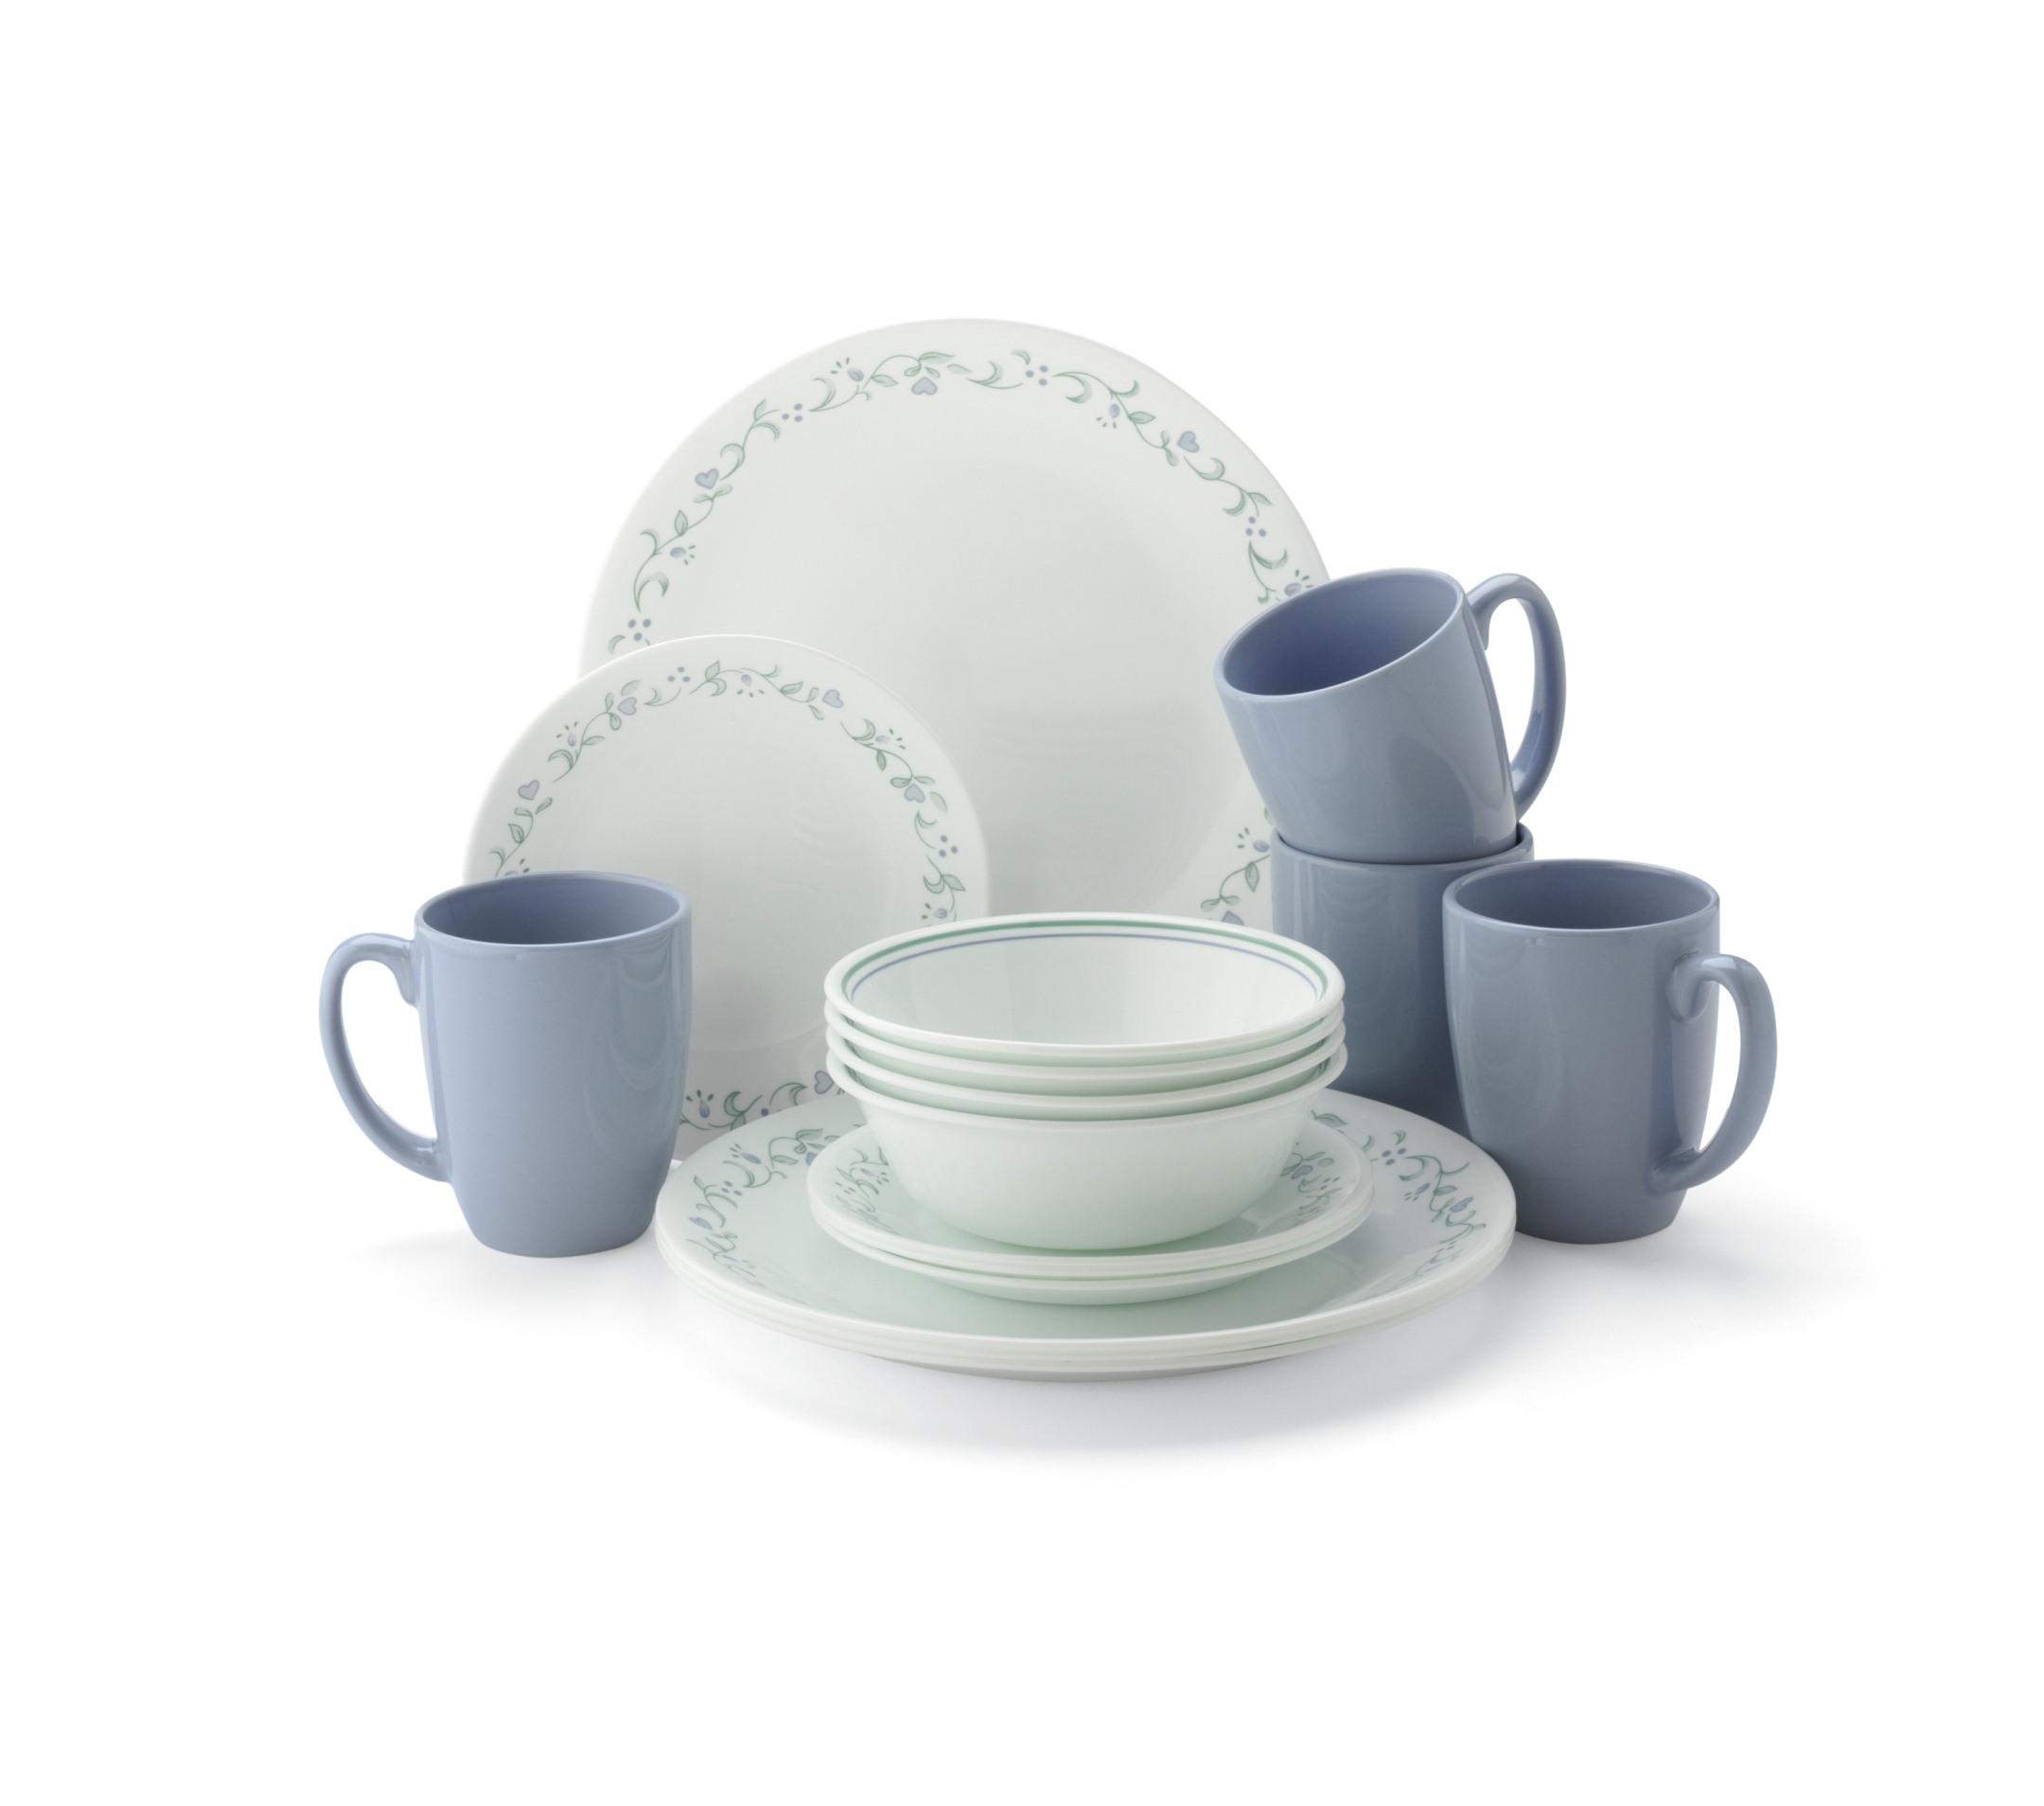 Lovely Corelle Livingware 16 Piece Dinnerware Set   Country Cottage